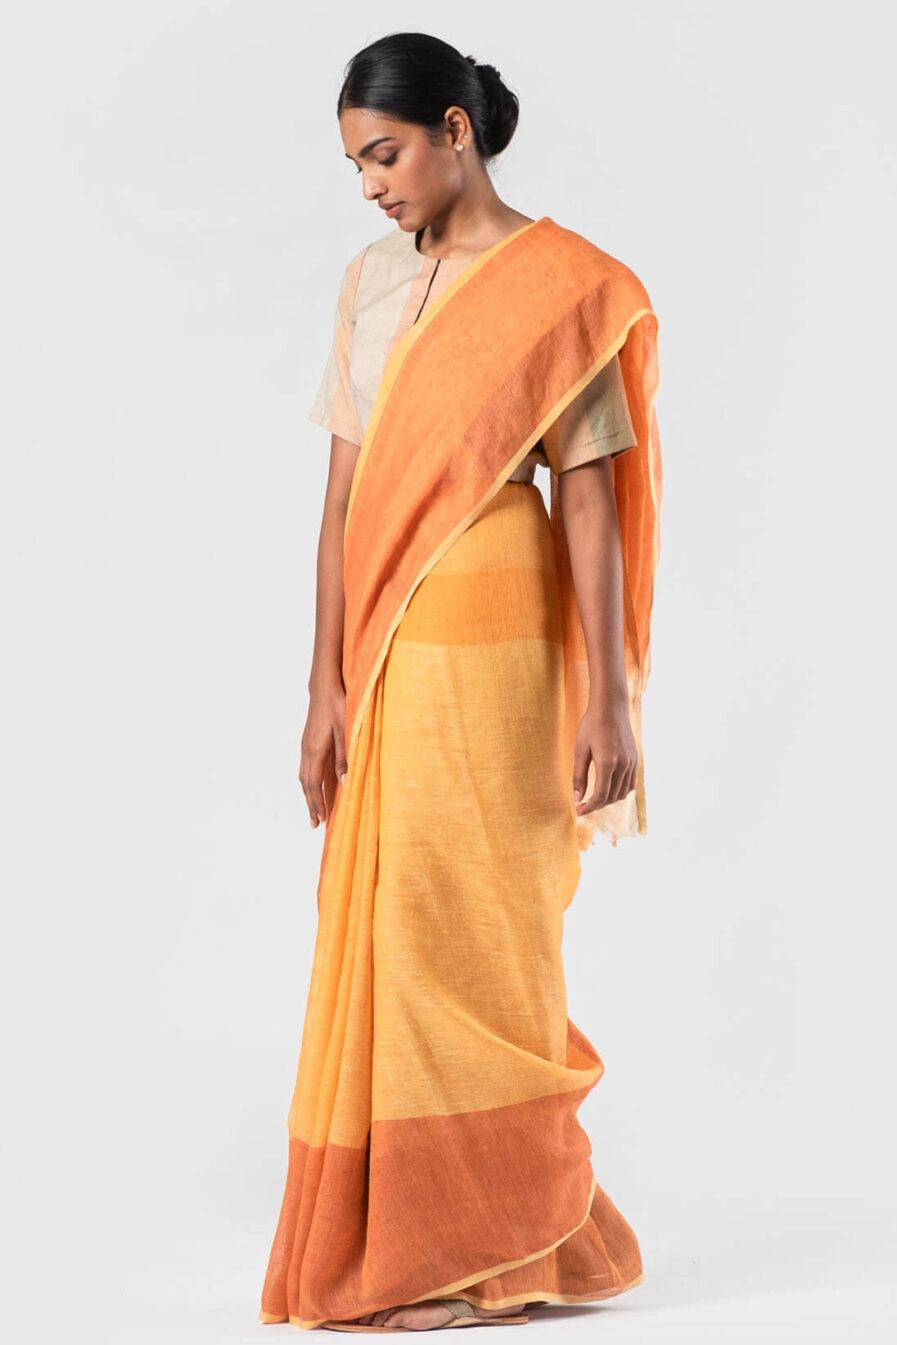 Anavila Tan and tangerine linen sari